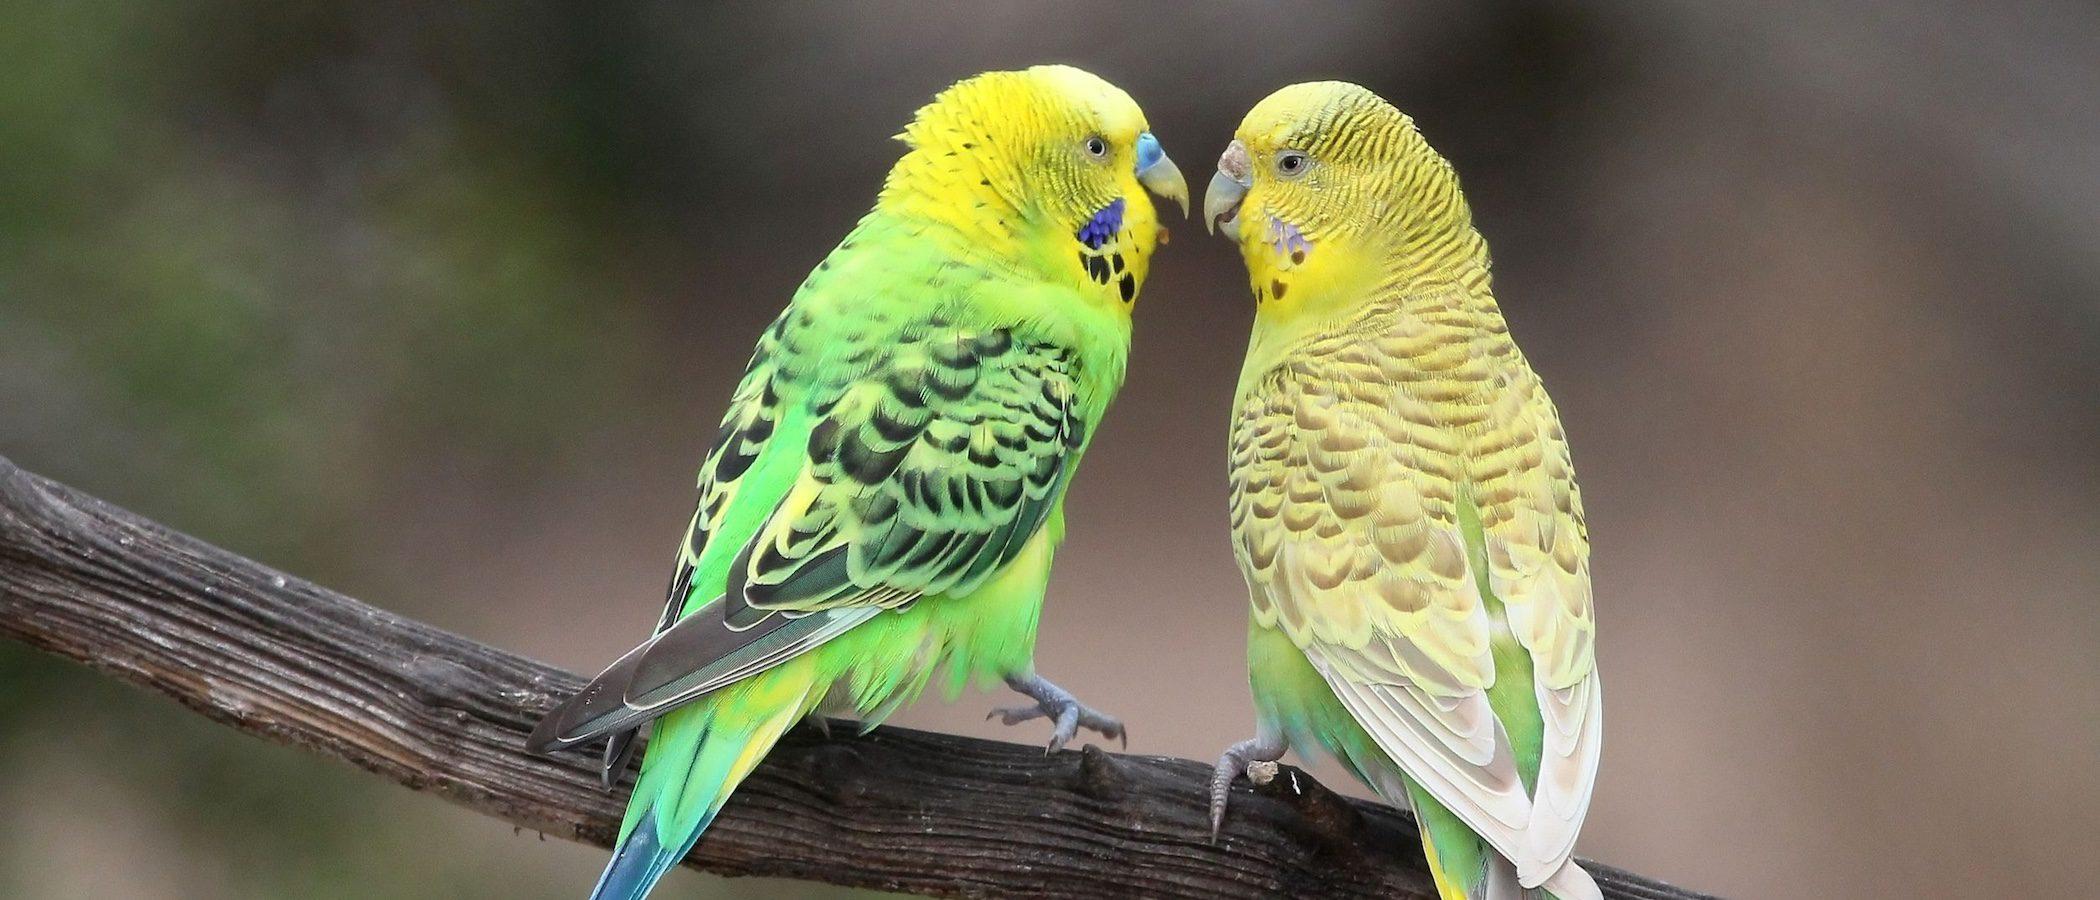 Periquito papillero: Conoce todo sobre este pájaro